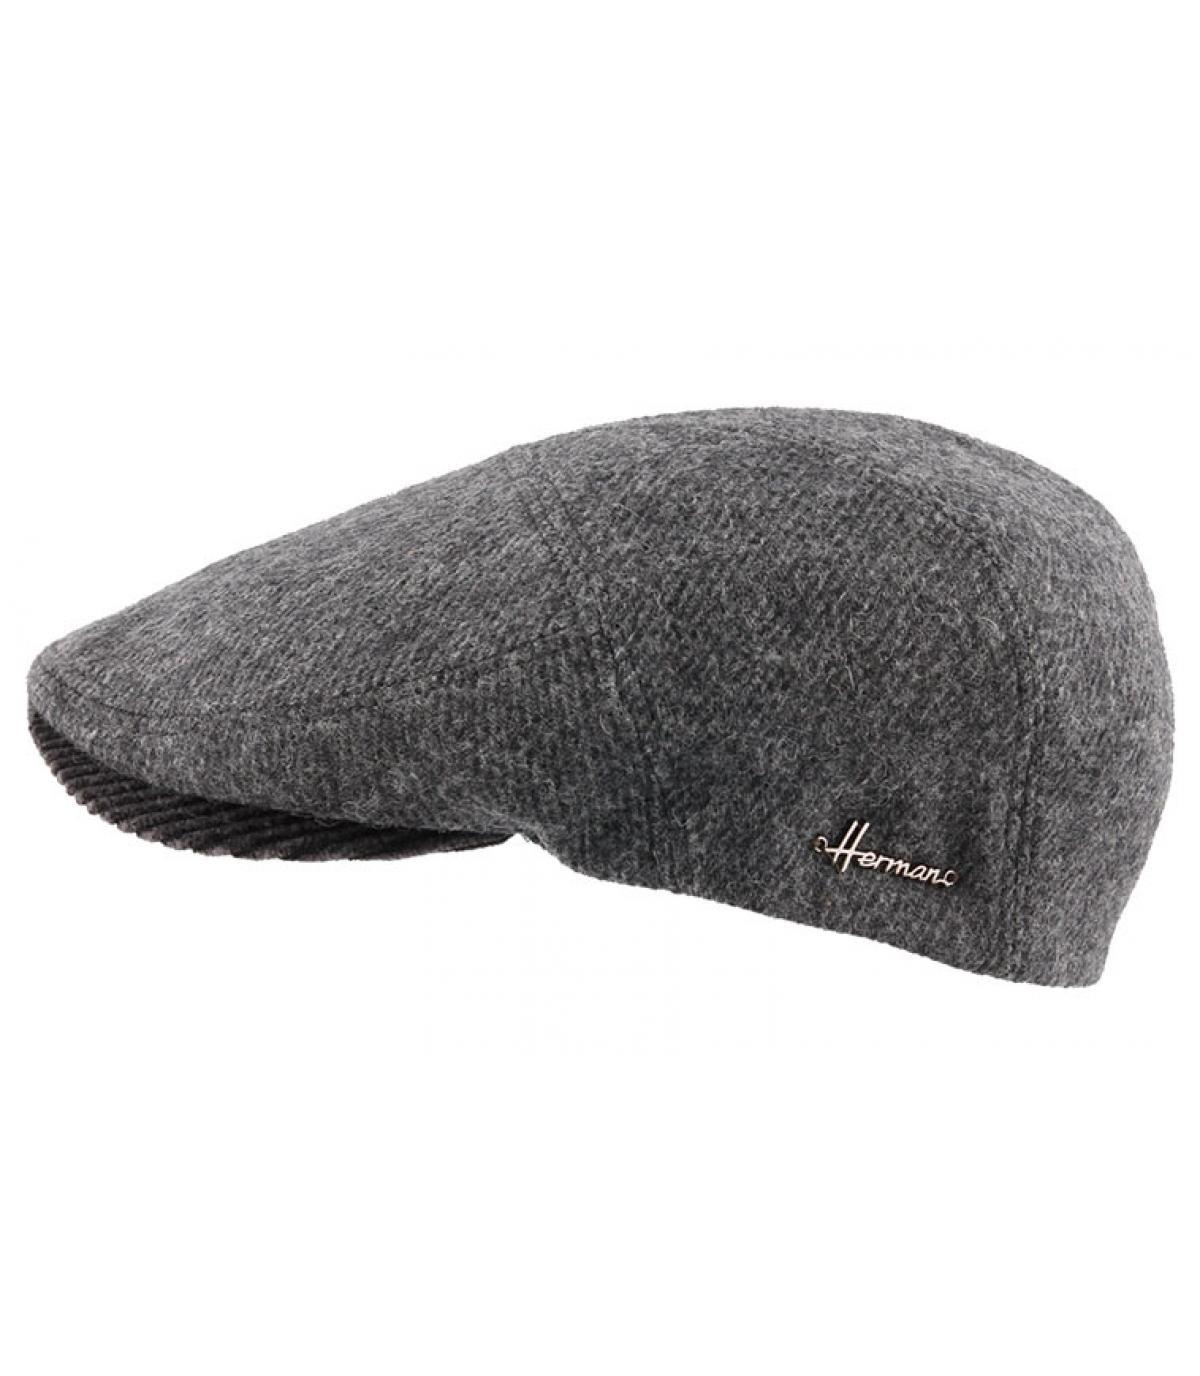 Details Barents Wool Corduroy grey - Abbildung 2